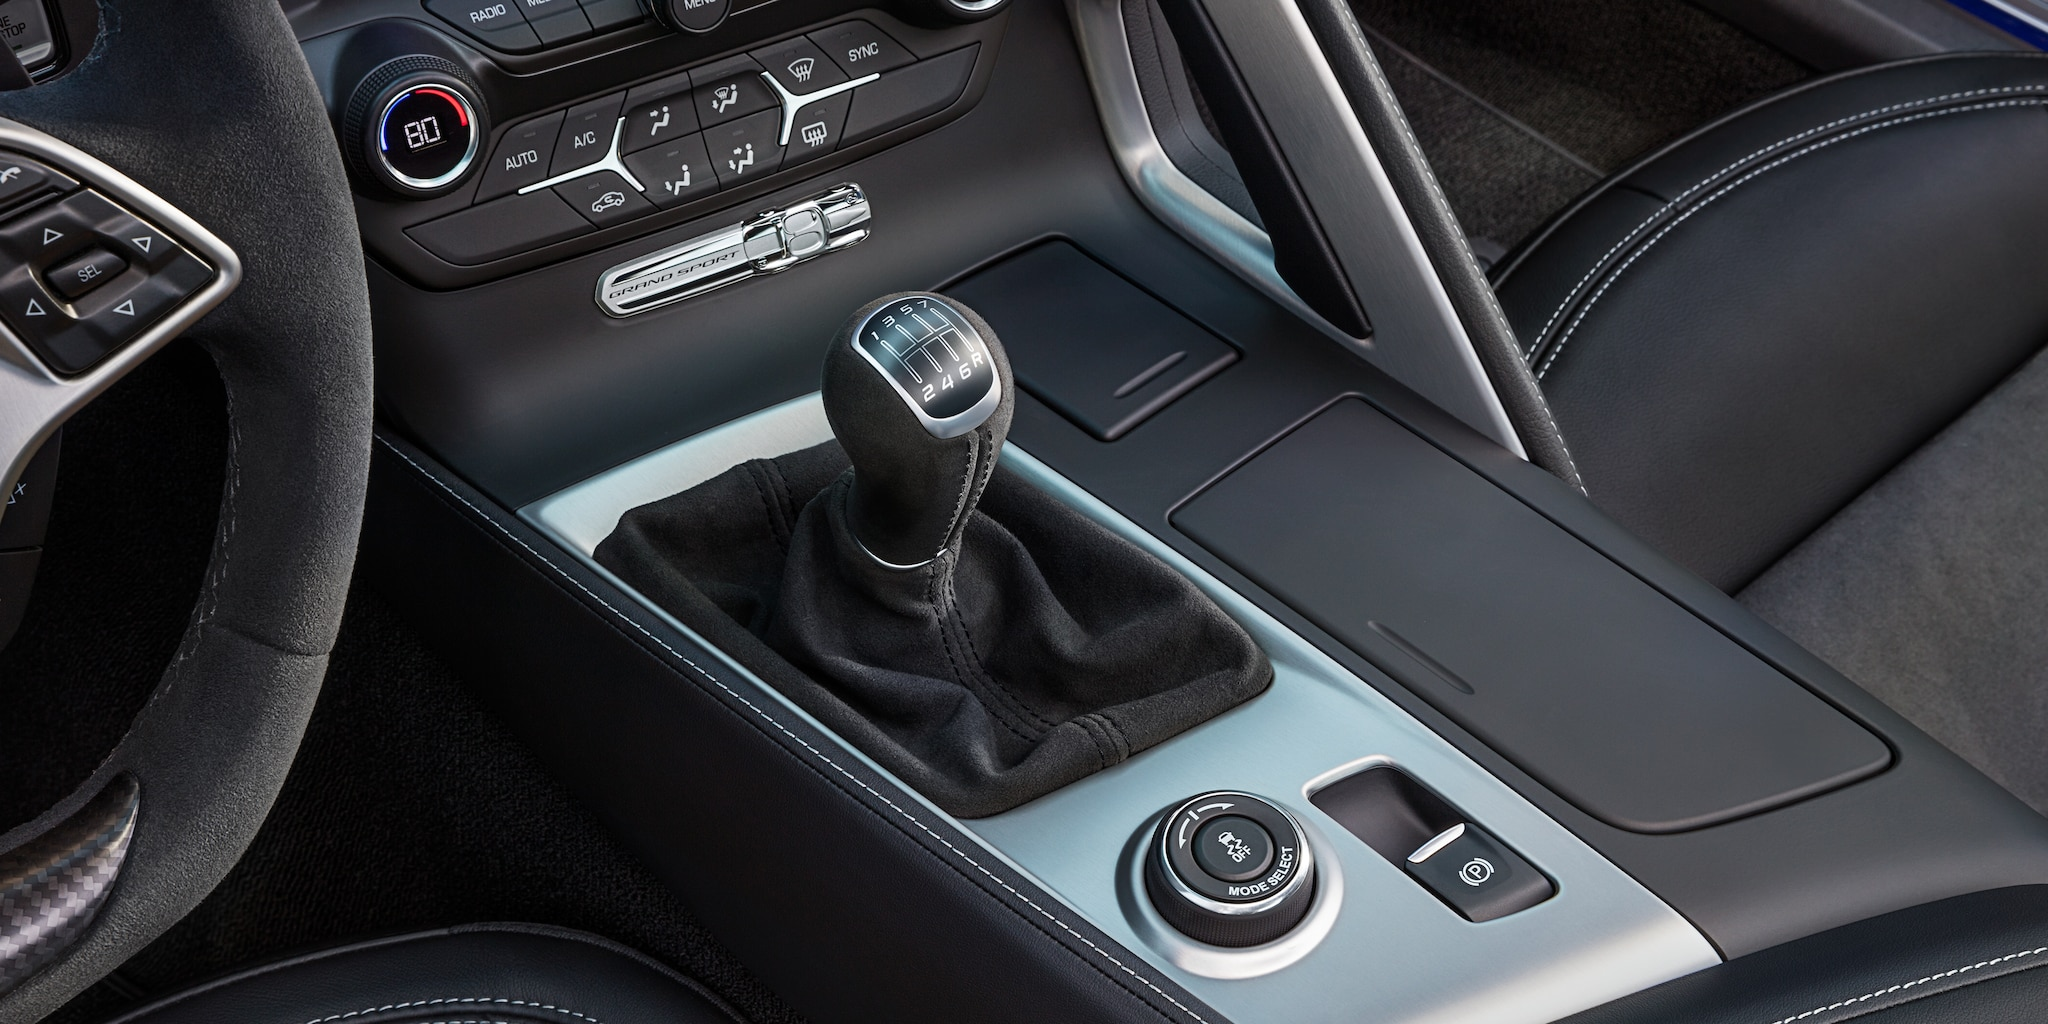 Diseño del auto deportivo Corvette Grand Sport 2018: palanca de cambios